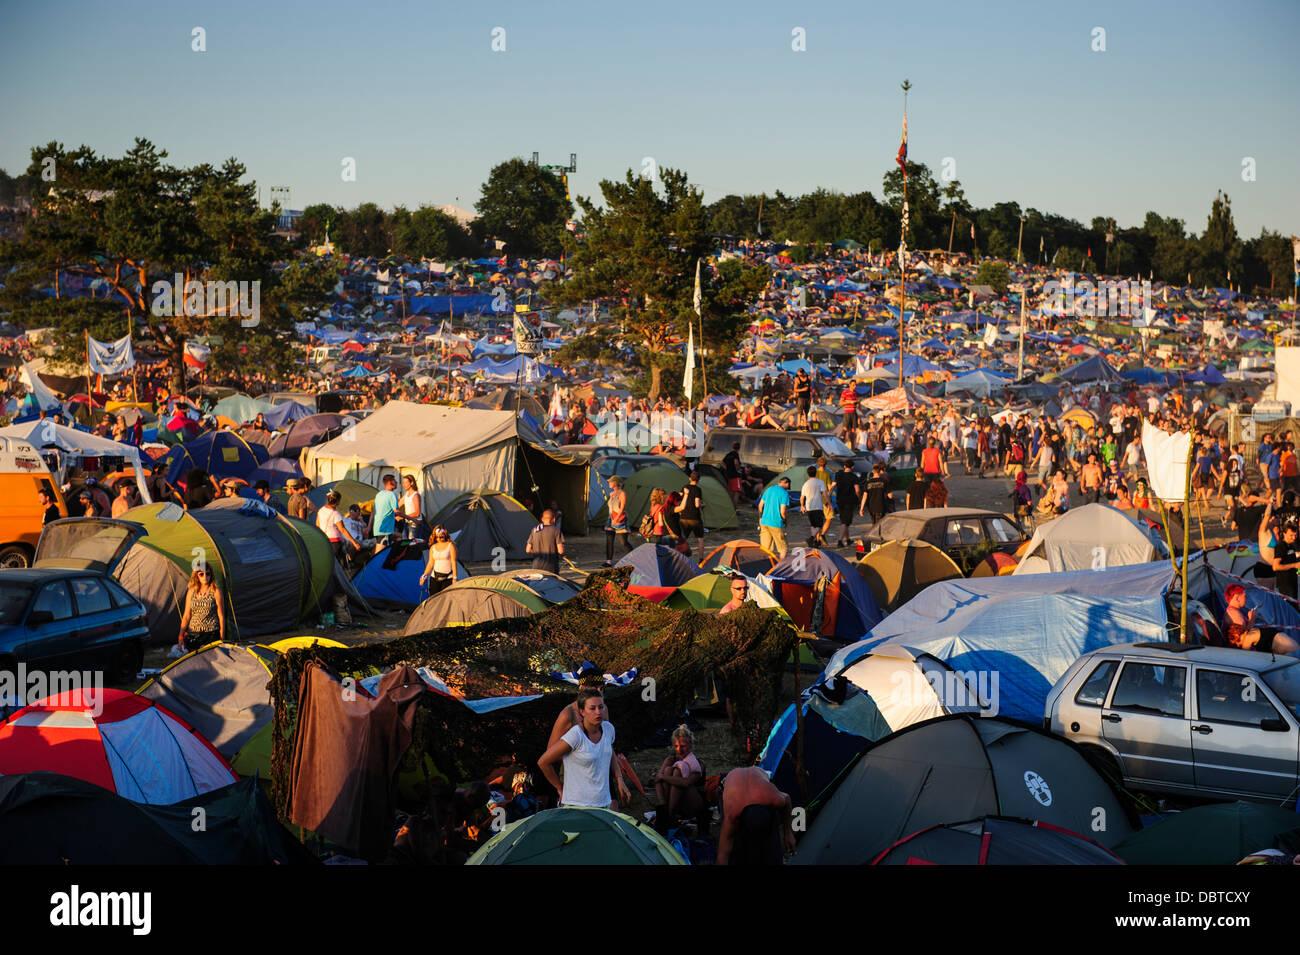 Vista general del campamento principal en el Przystanek Woodstock music festival, Kostrzyn, Polonia. Imagen De Stock